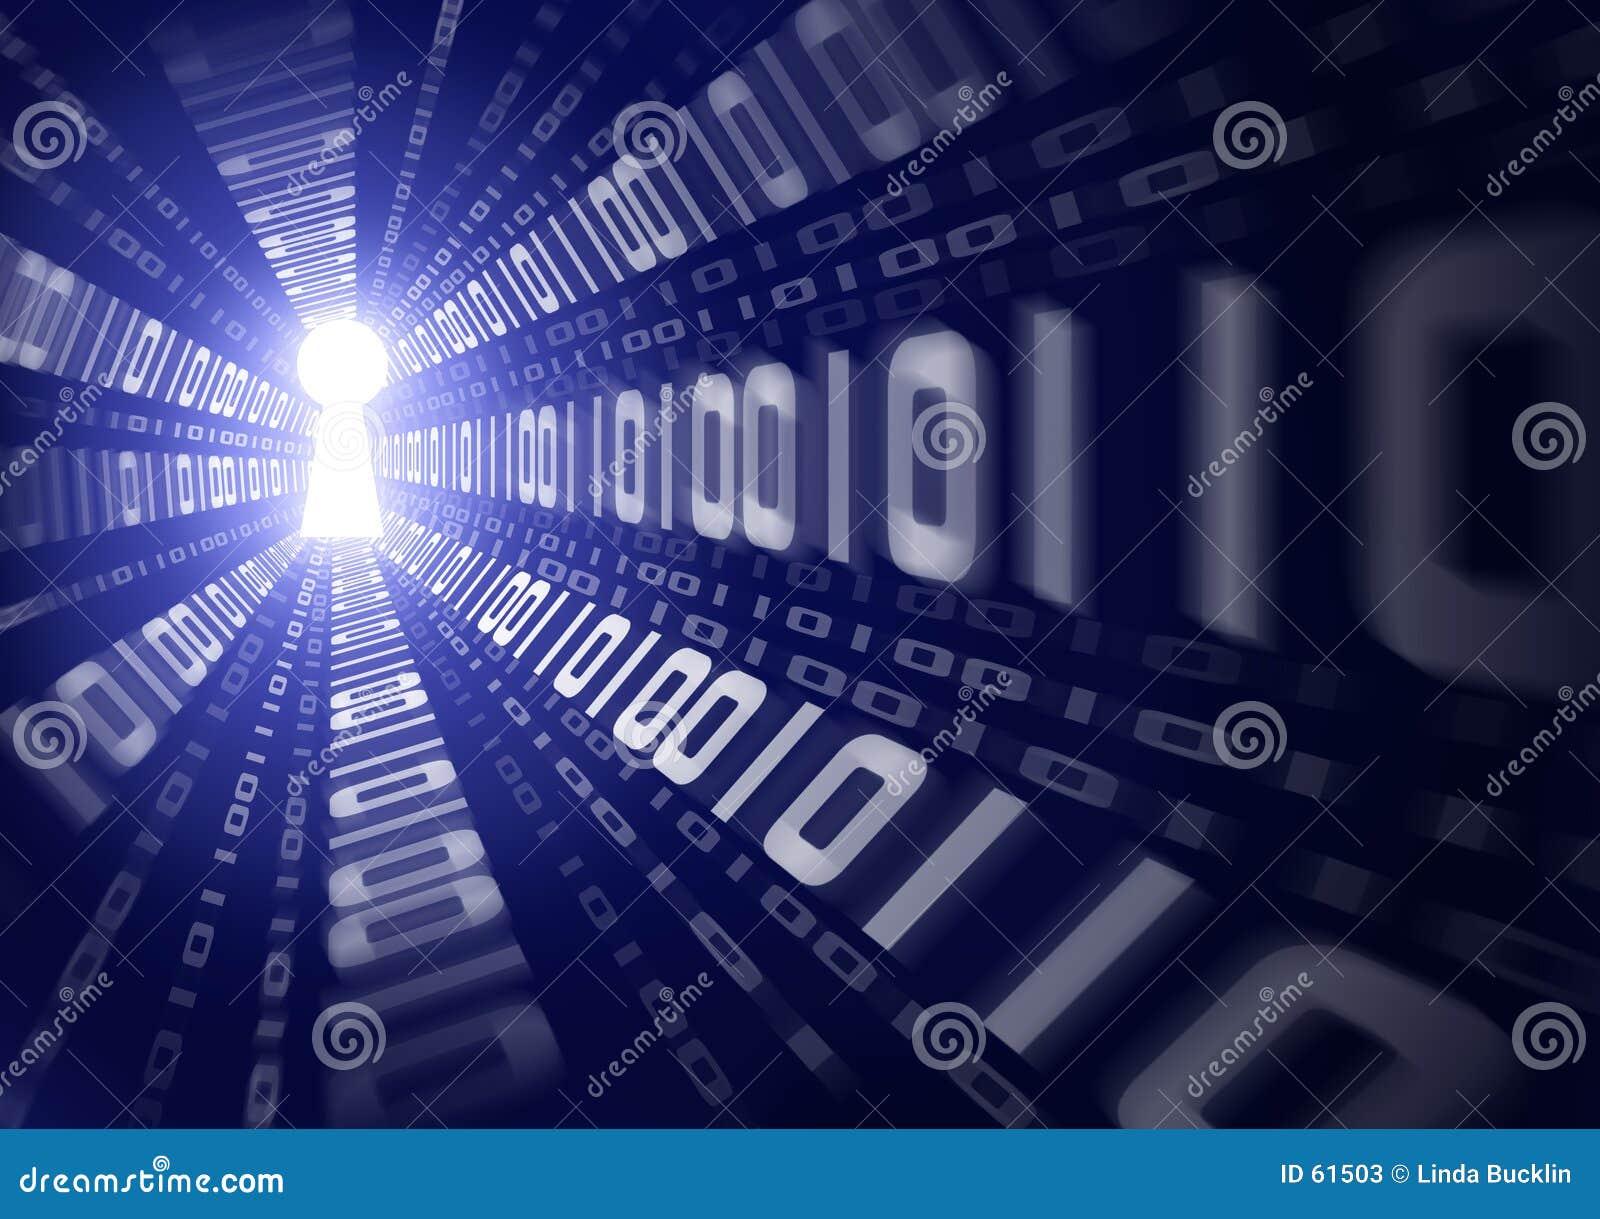 binary data leak stock photos image 61503